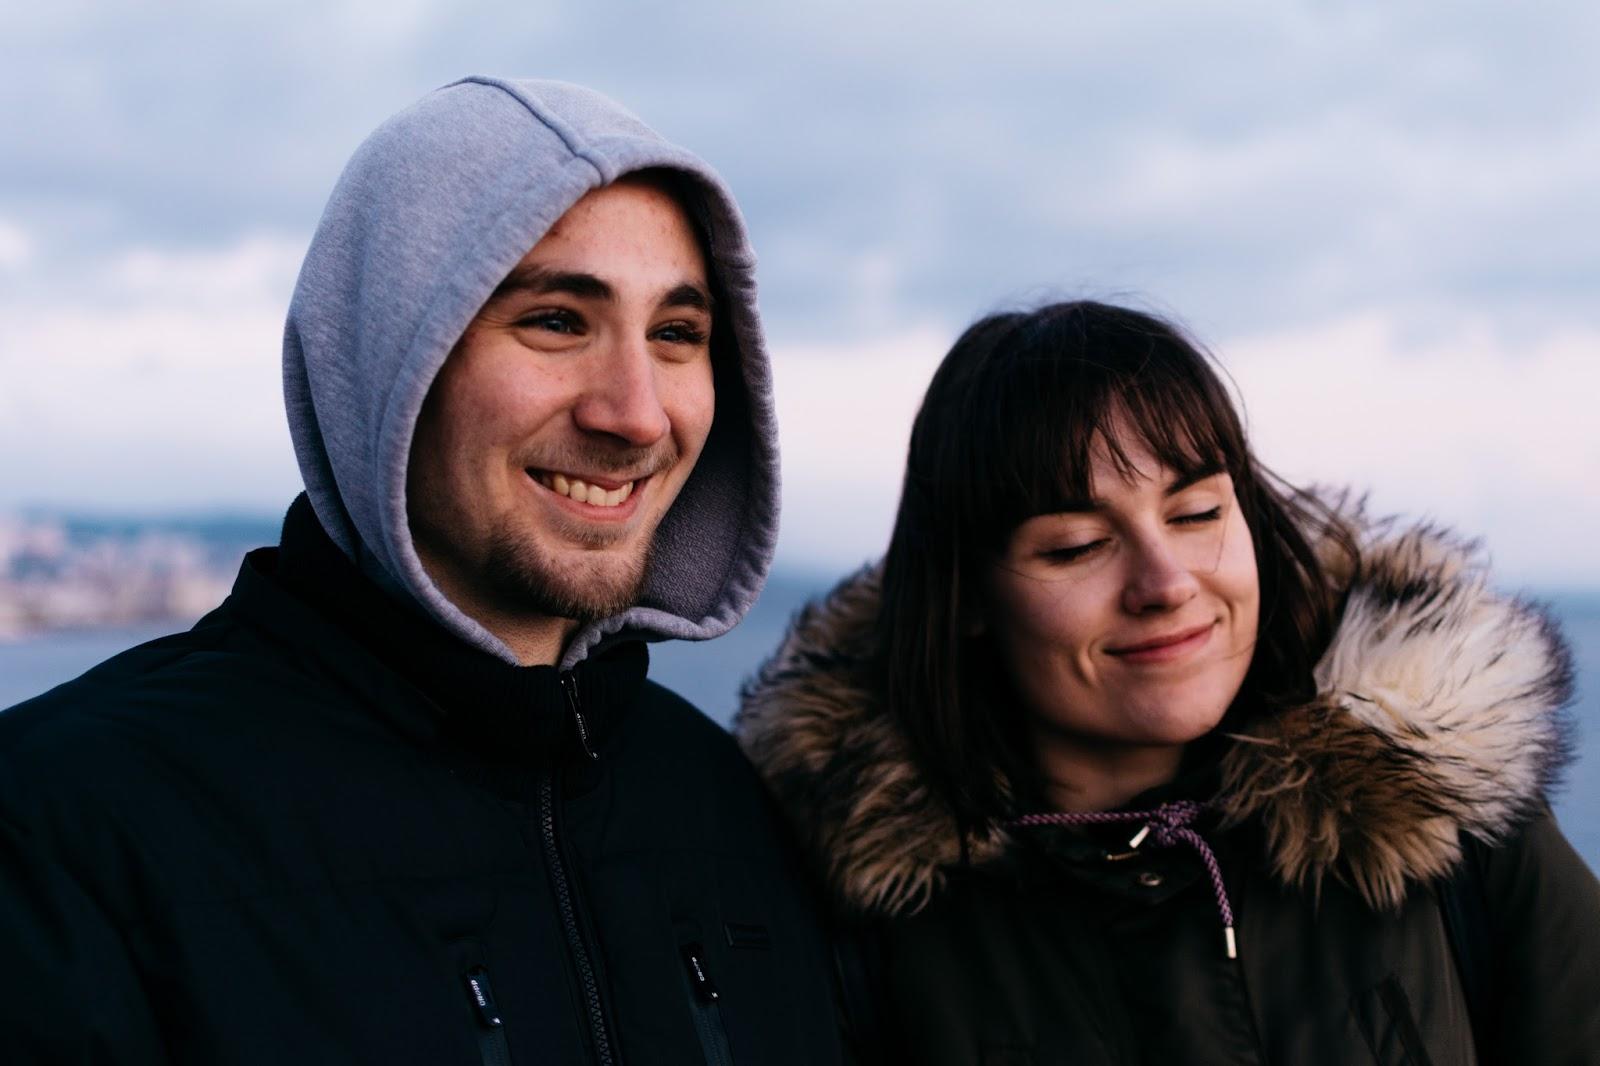 Smiley Mladen and Ana